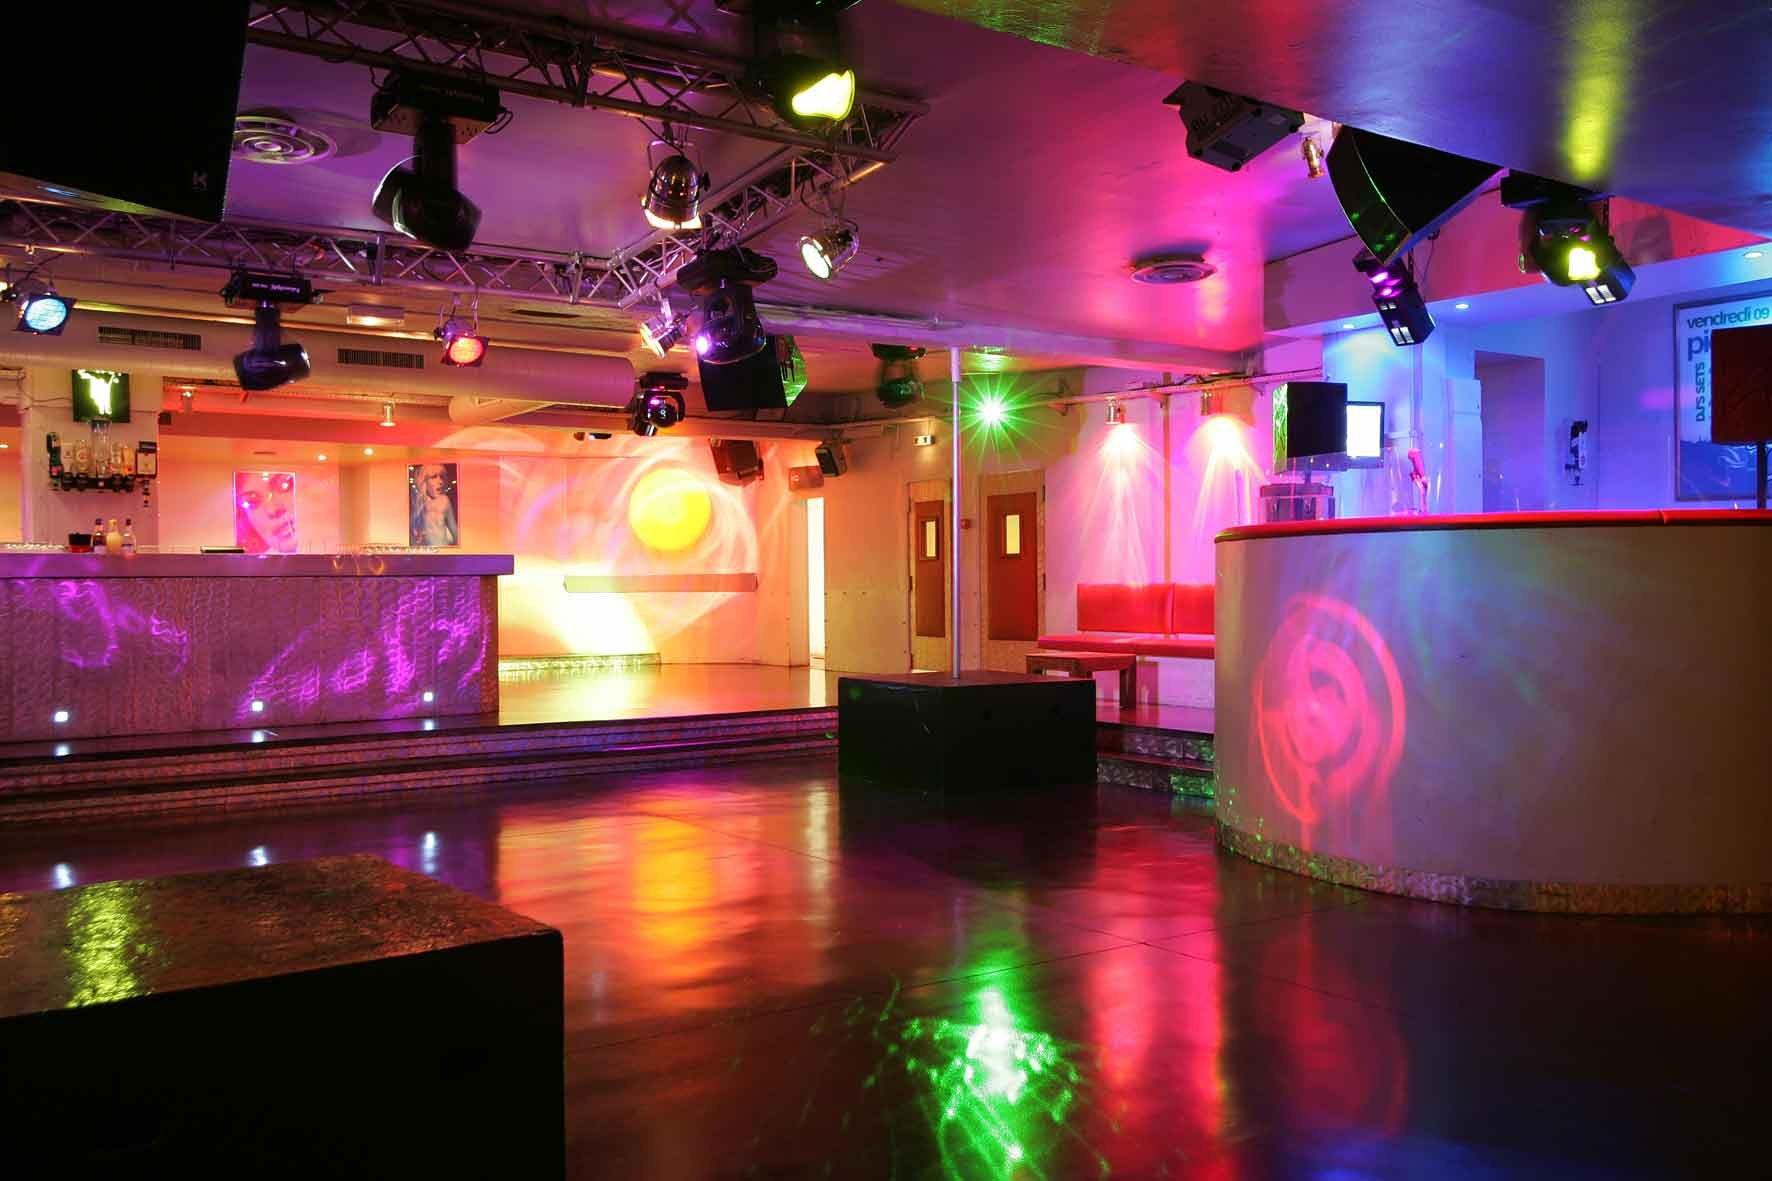 Wallpaper Hd For Living Room Disco Dance Music Club Design Room Wallpaper 1772x1181